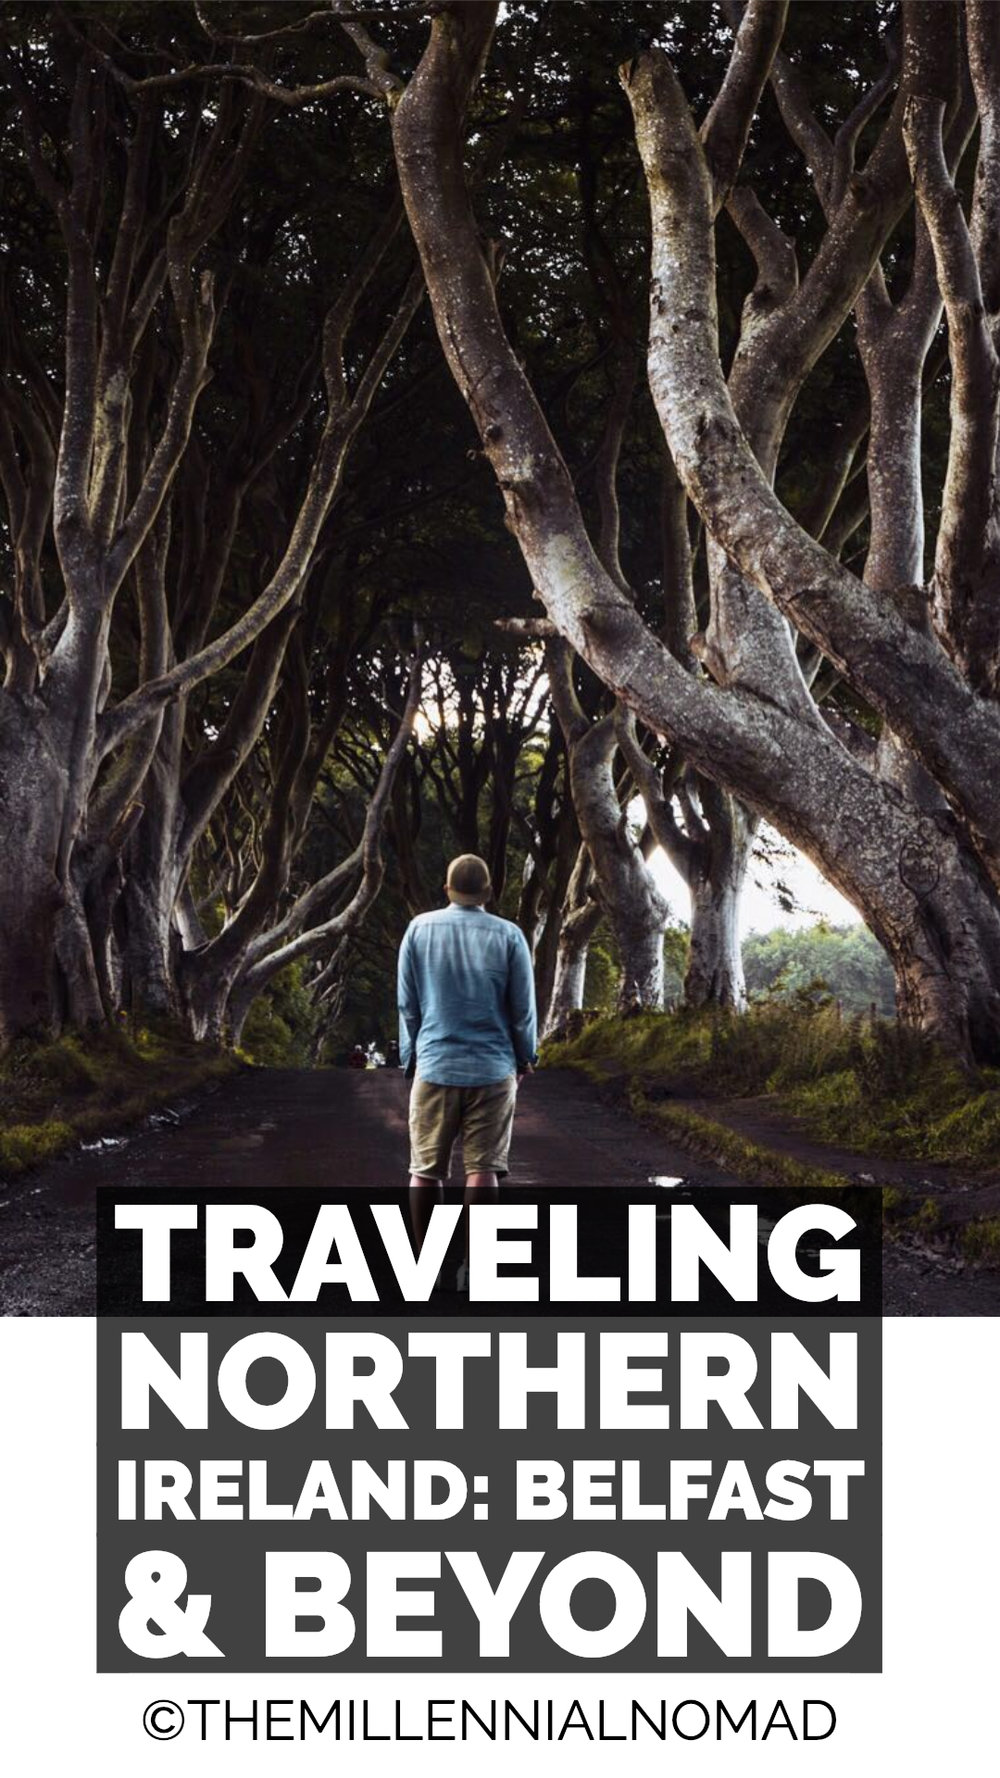 Traveling northern ireland: belfast and beyond